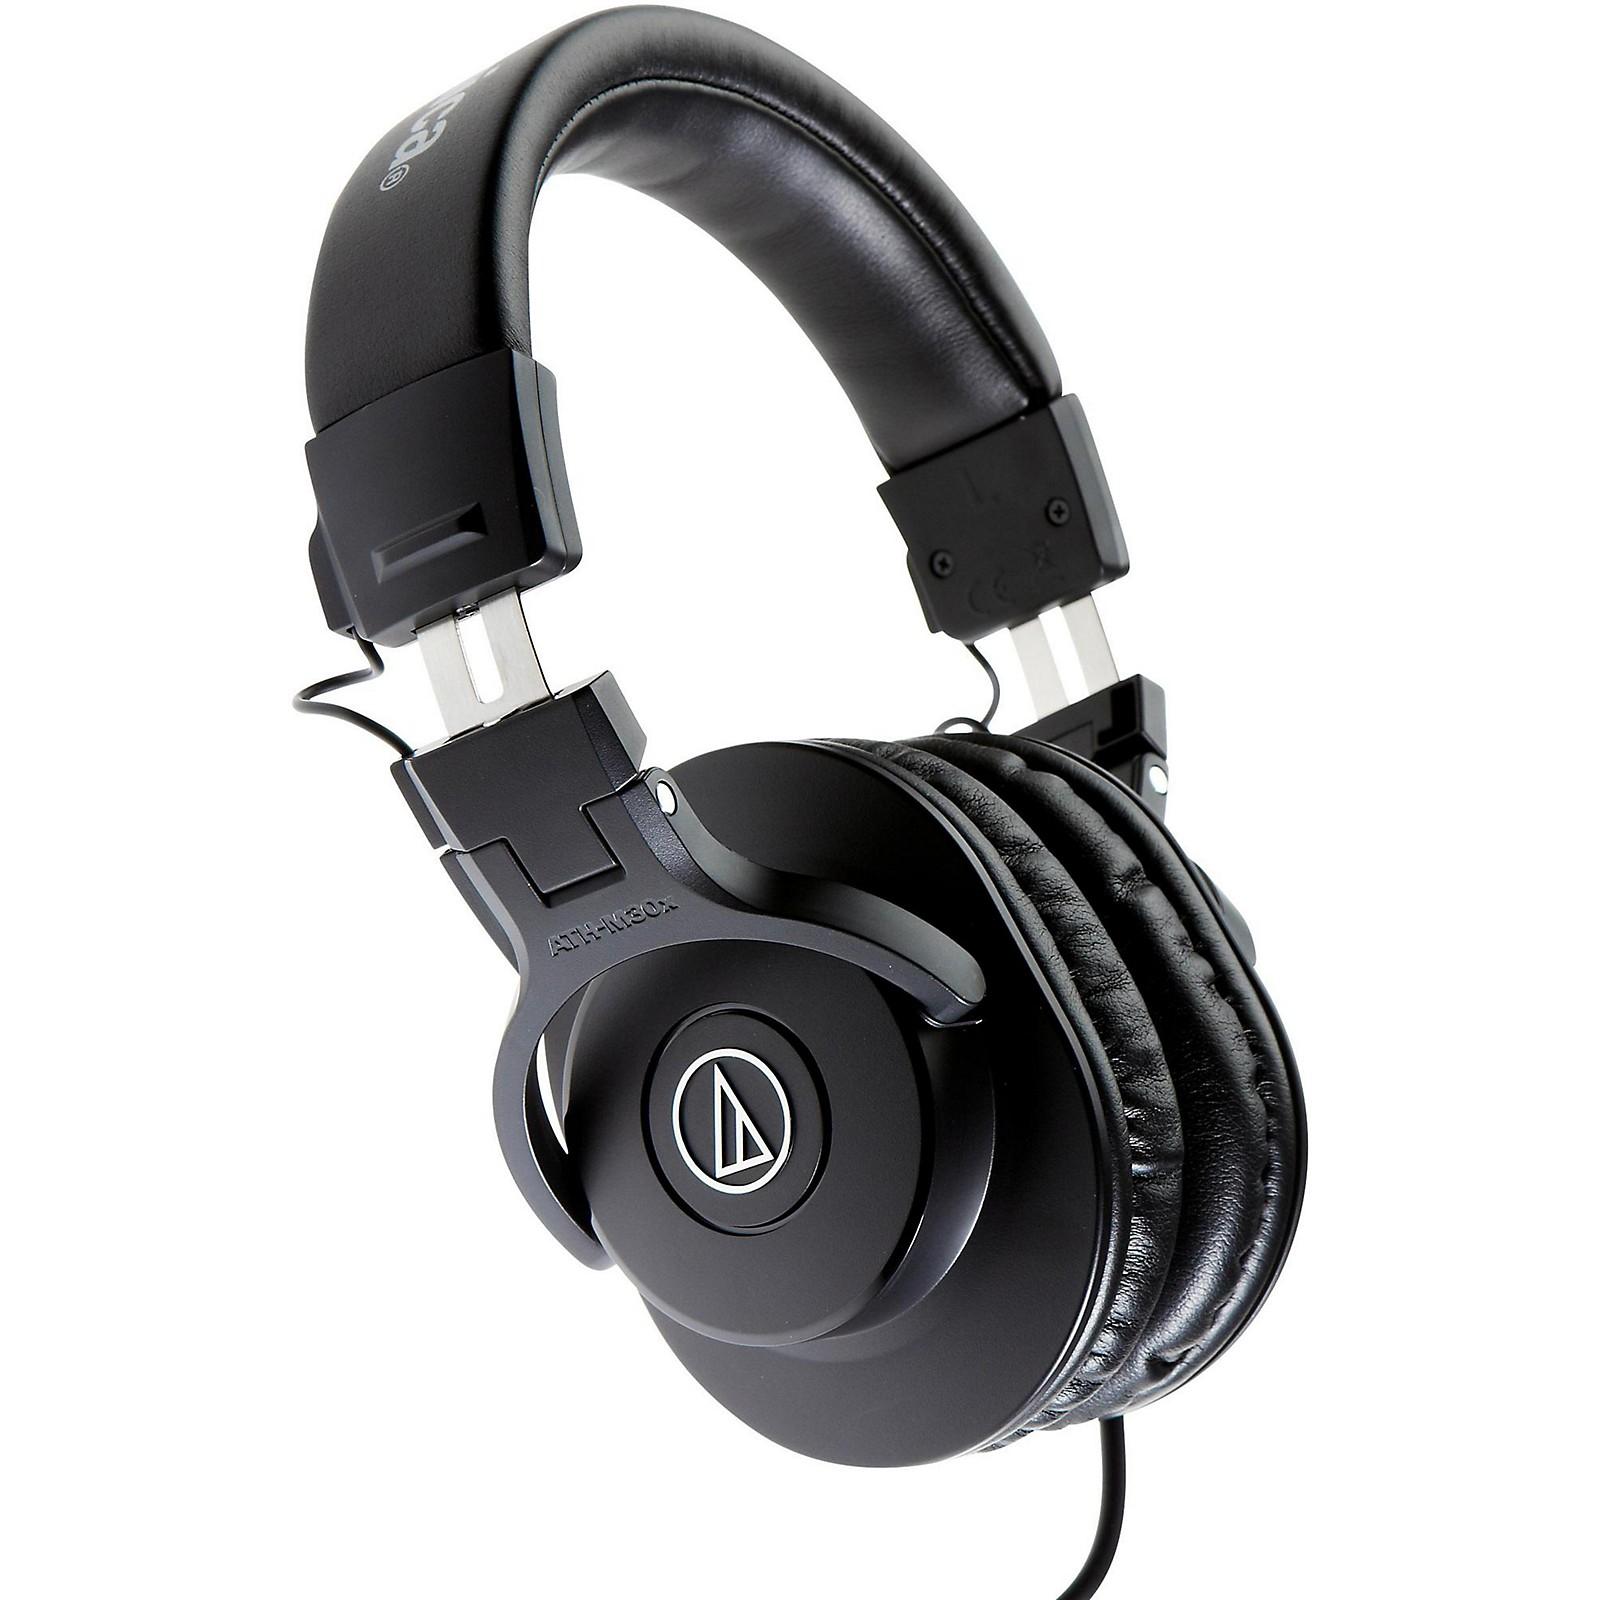 Audio-Technica ATH-M30x Closed-Back Professional Studio Monitor Headphones